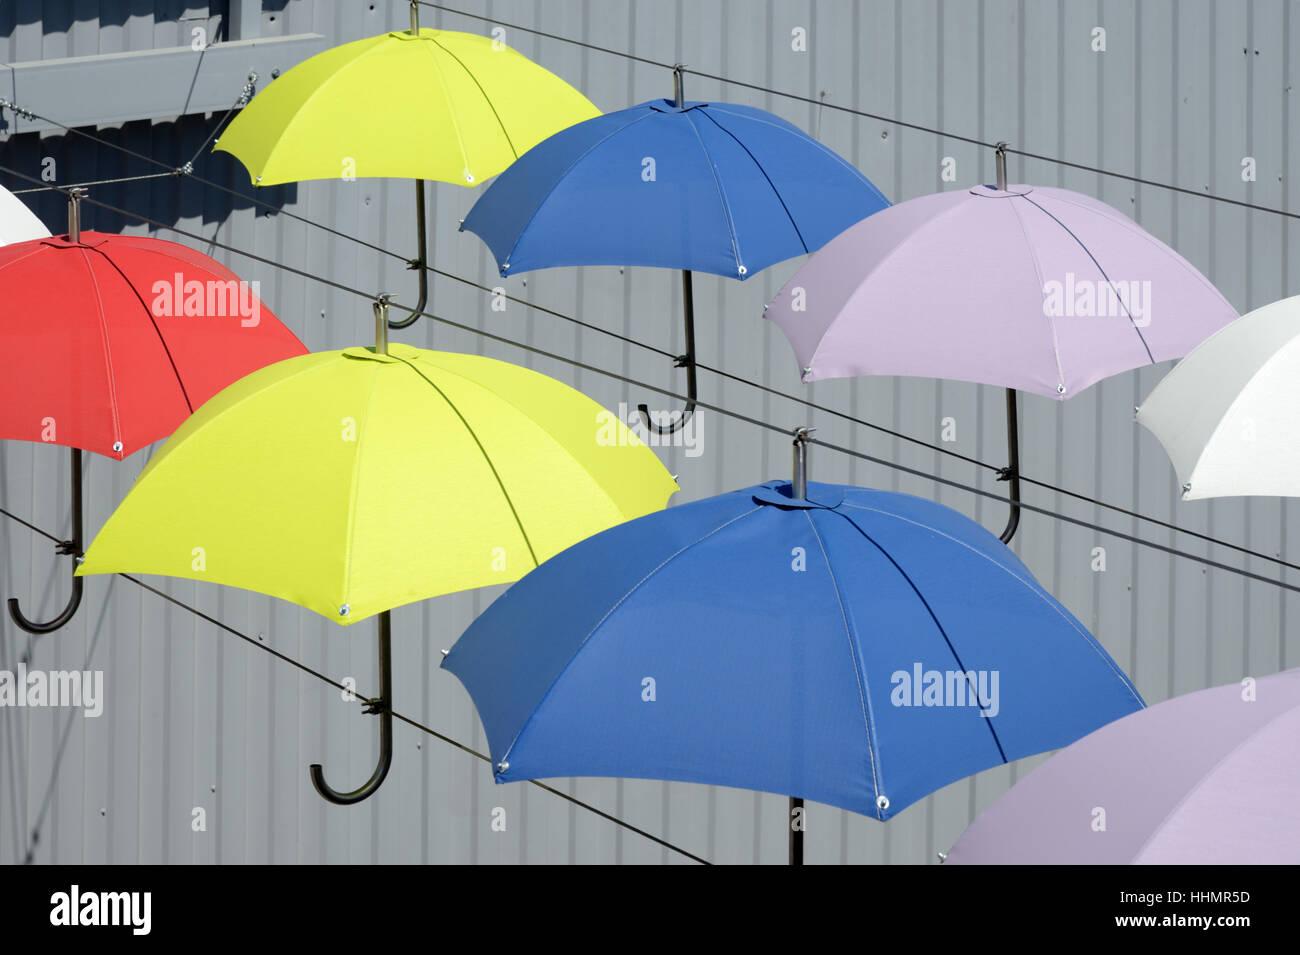 Bunte Regenschirme oder Regenschirm Kunst Installation Aix-en-Provence Frankreich Stockbild